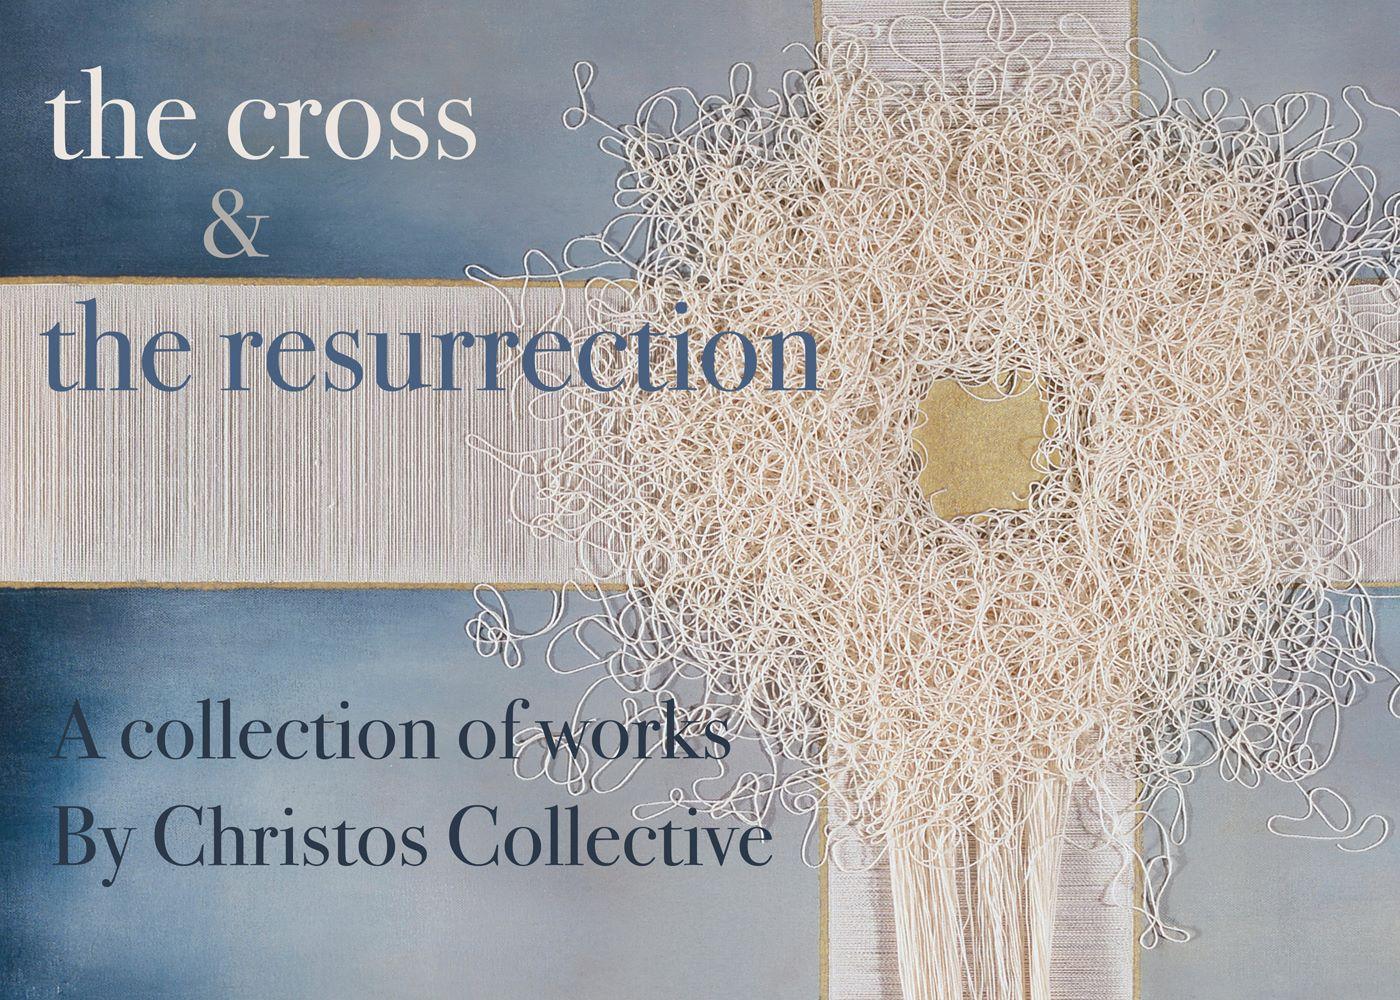 the cross & resurrection show card.jpg